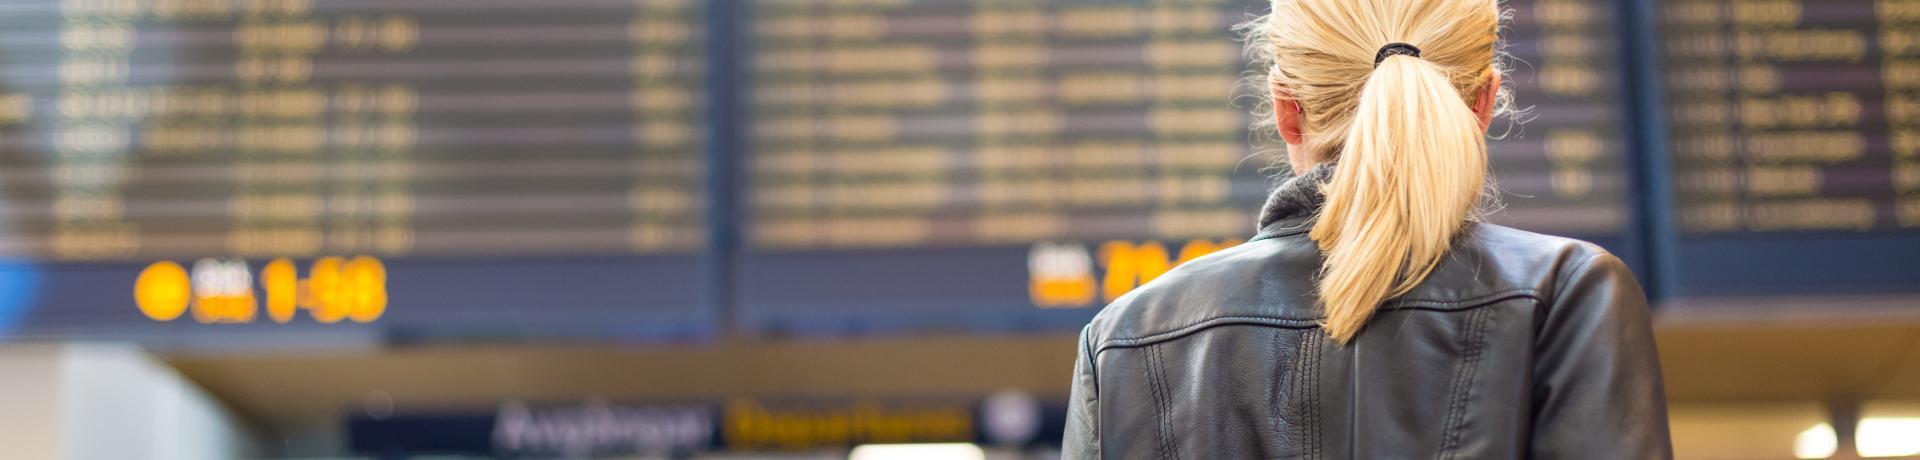 Flugverspätung: Flughafen - Anzeigetafel - Frau - Emotion